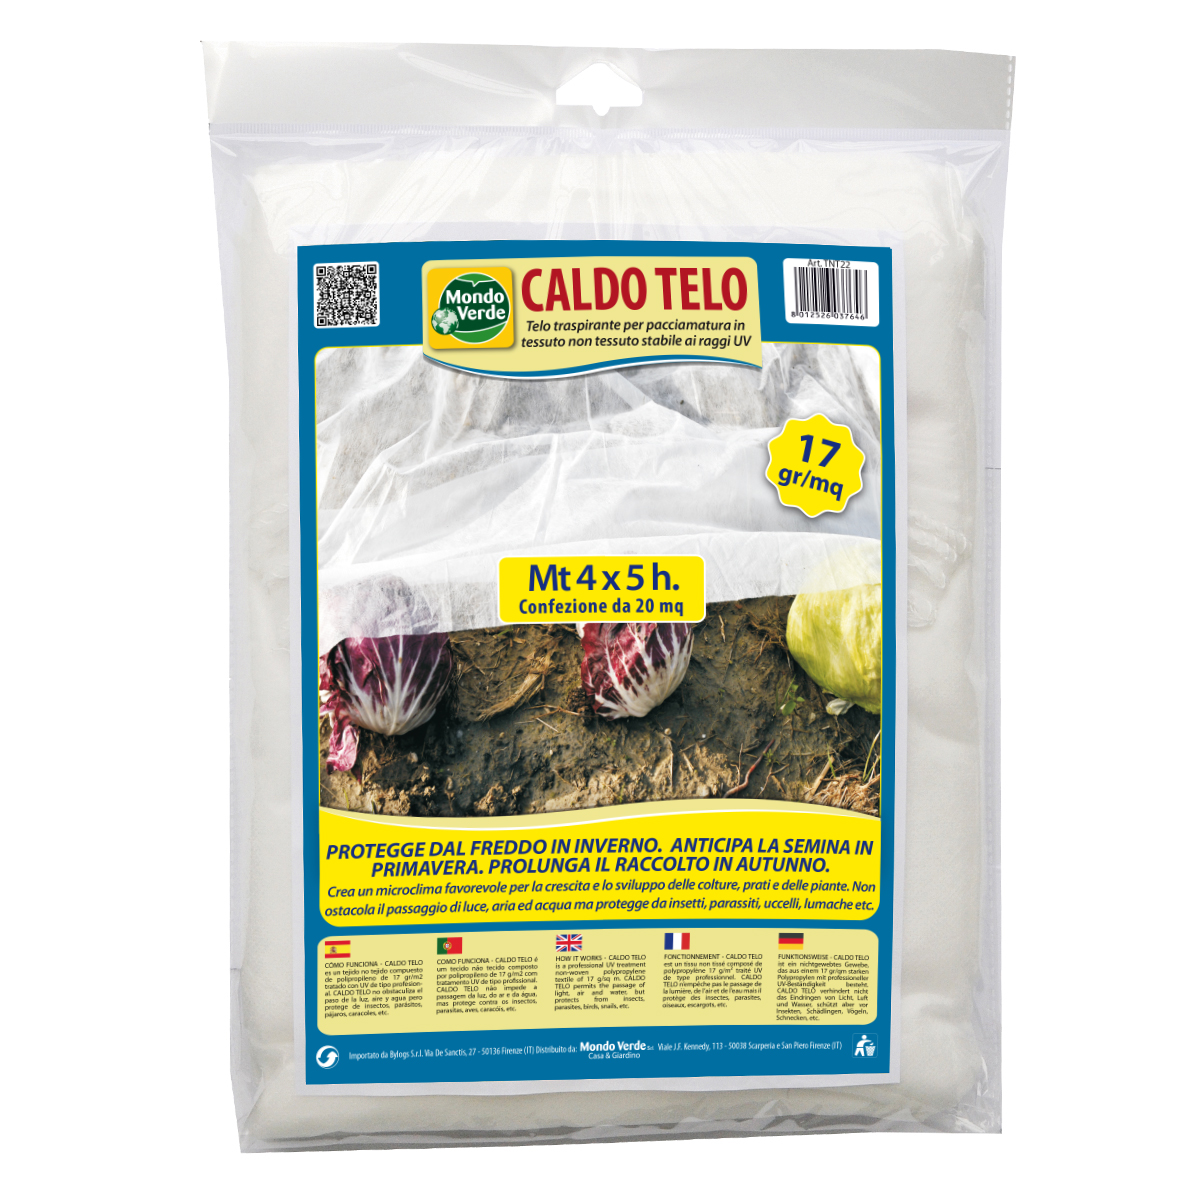 Caldo telo di tessuto non tessuto mt 4x5 per colture e piante 17gr mq - Telo tessuto non tessuto giardino ...